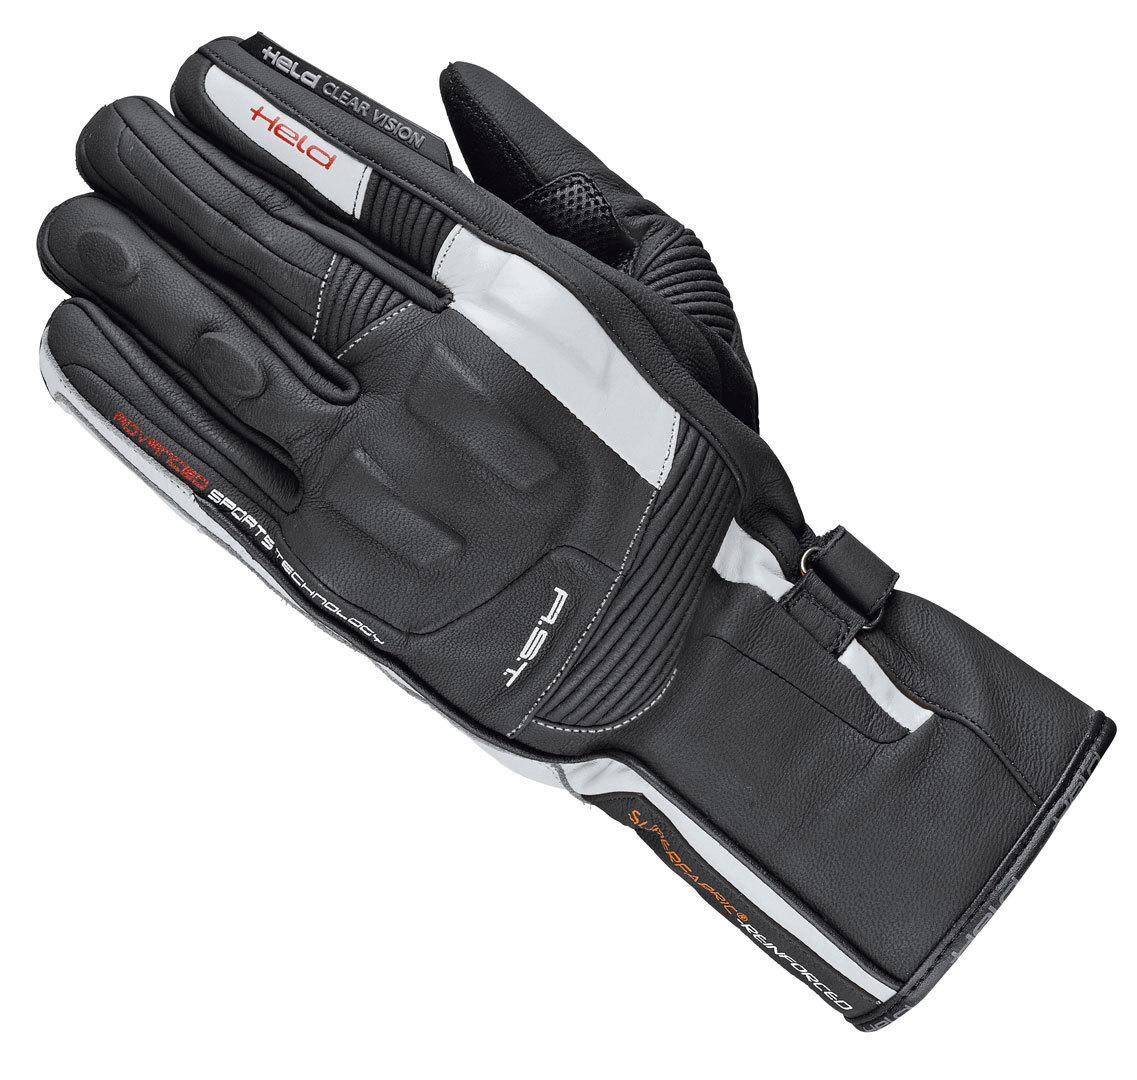 Held Secret-Pro Tourenhandschuhe, schwarz-weiss, Größe S, schwarz-weiss, Größe S